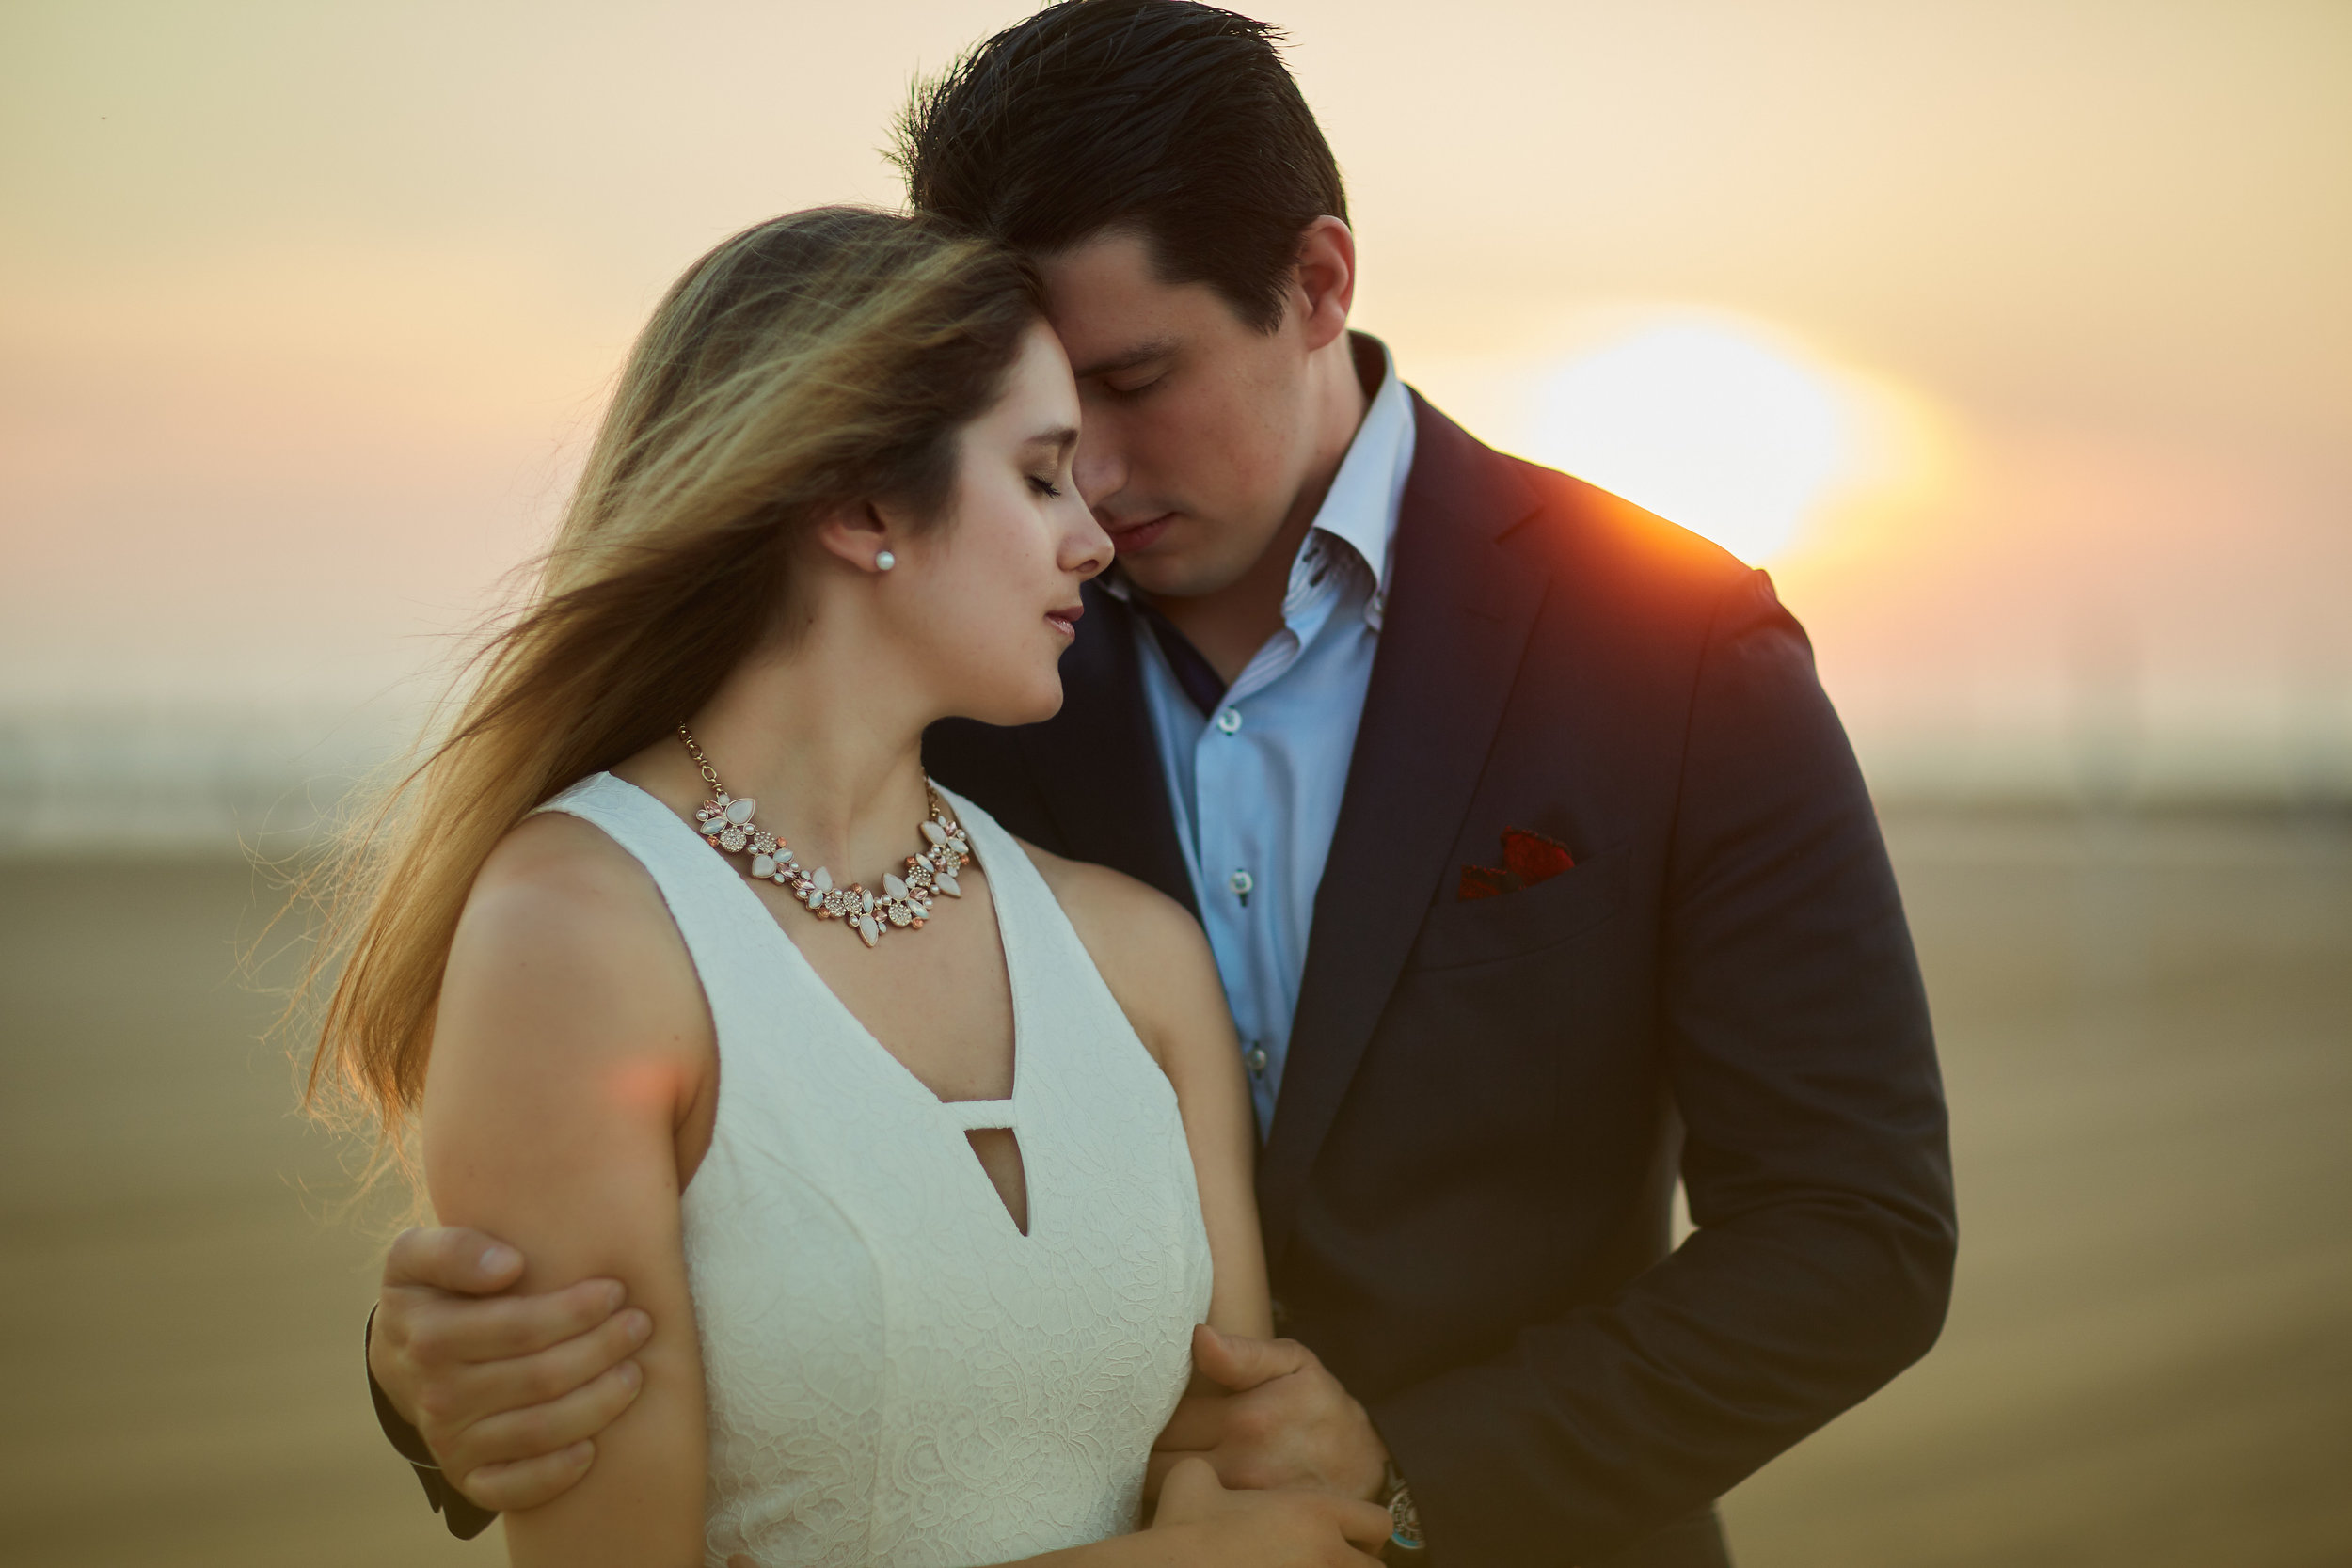 engaged couple photo shoot lake michigan chicago beach